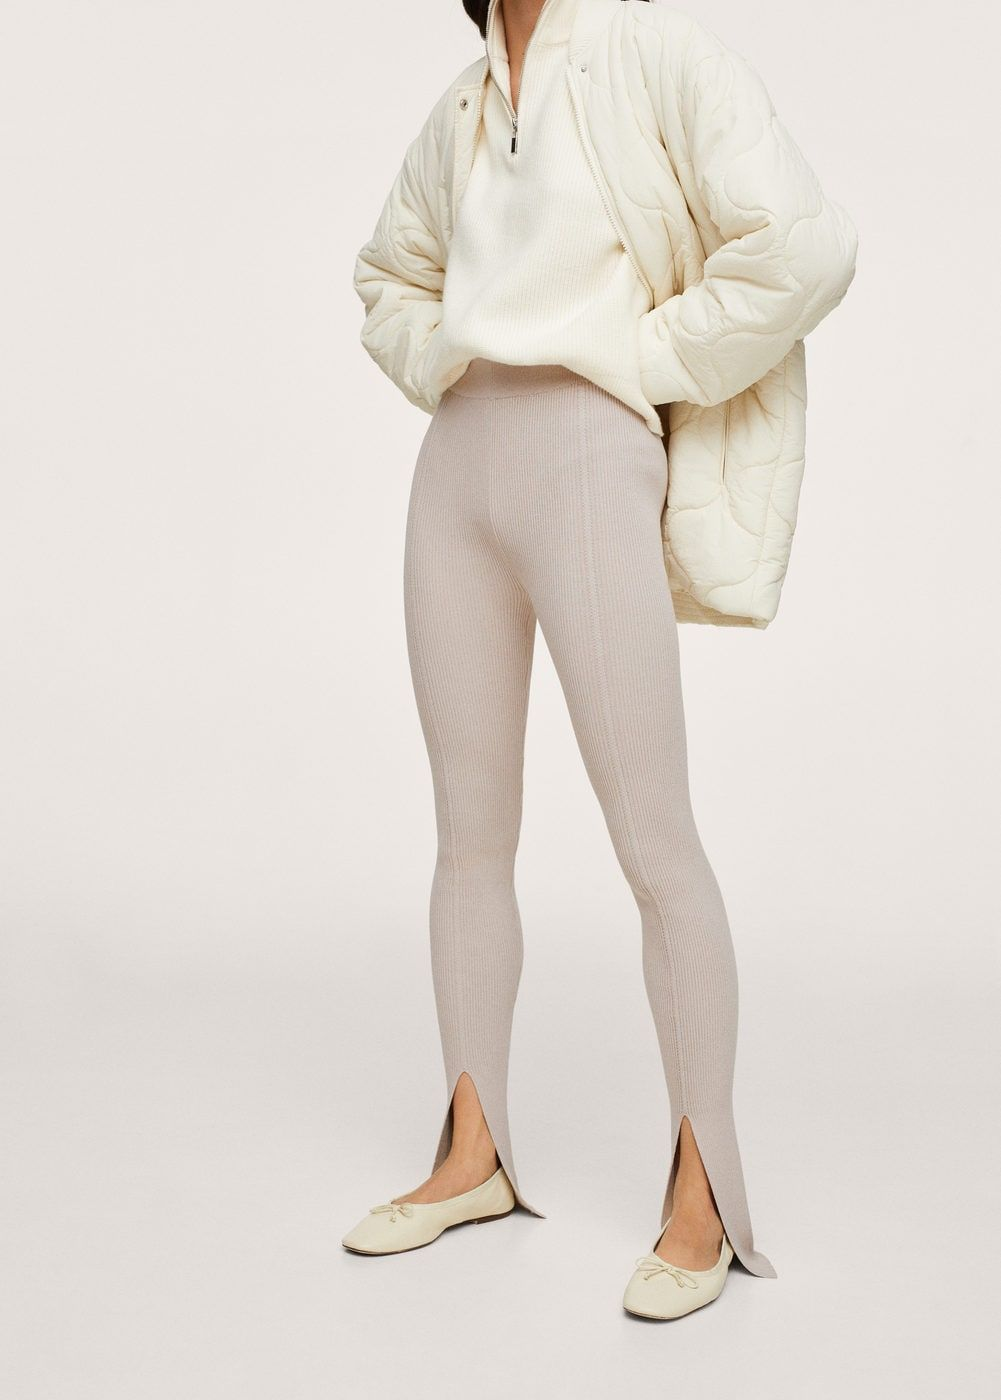 best new fashion items 286246 1629961874482